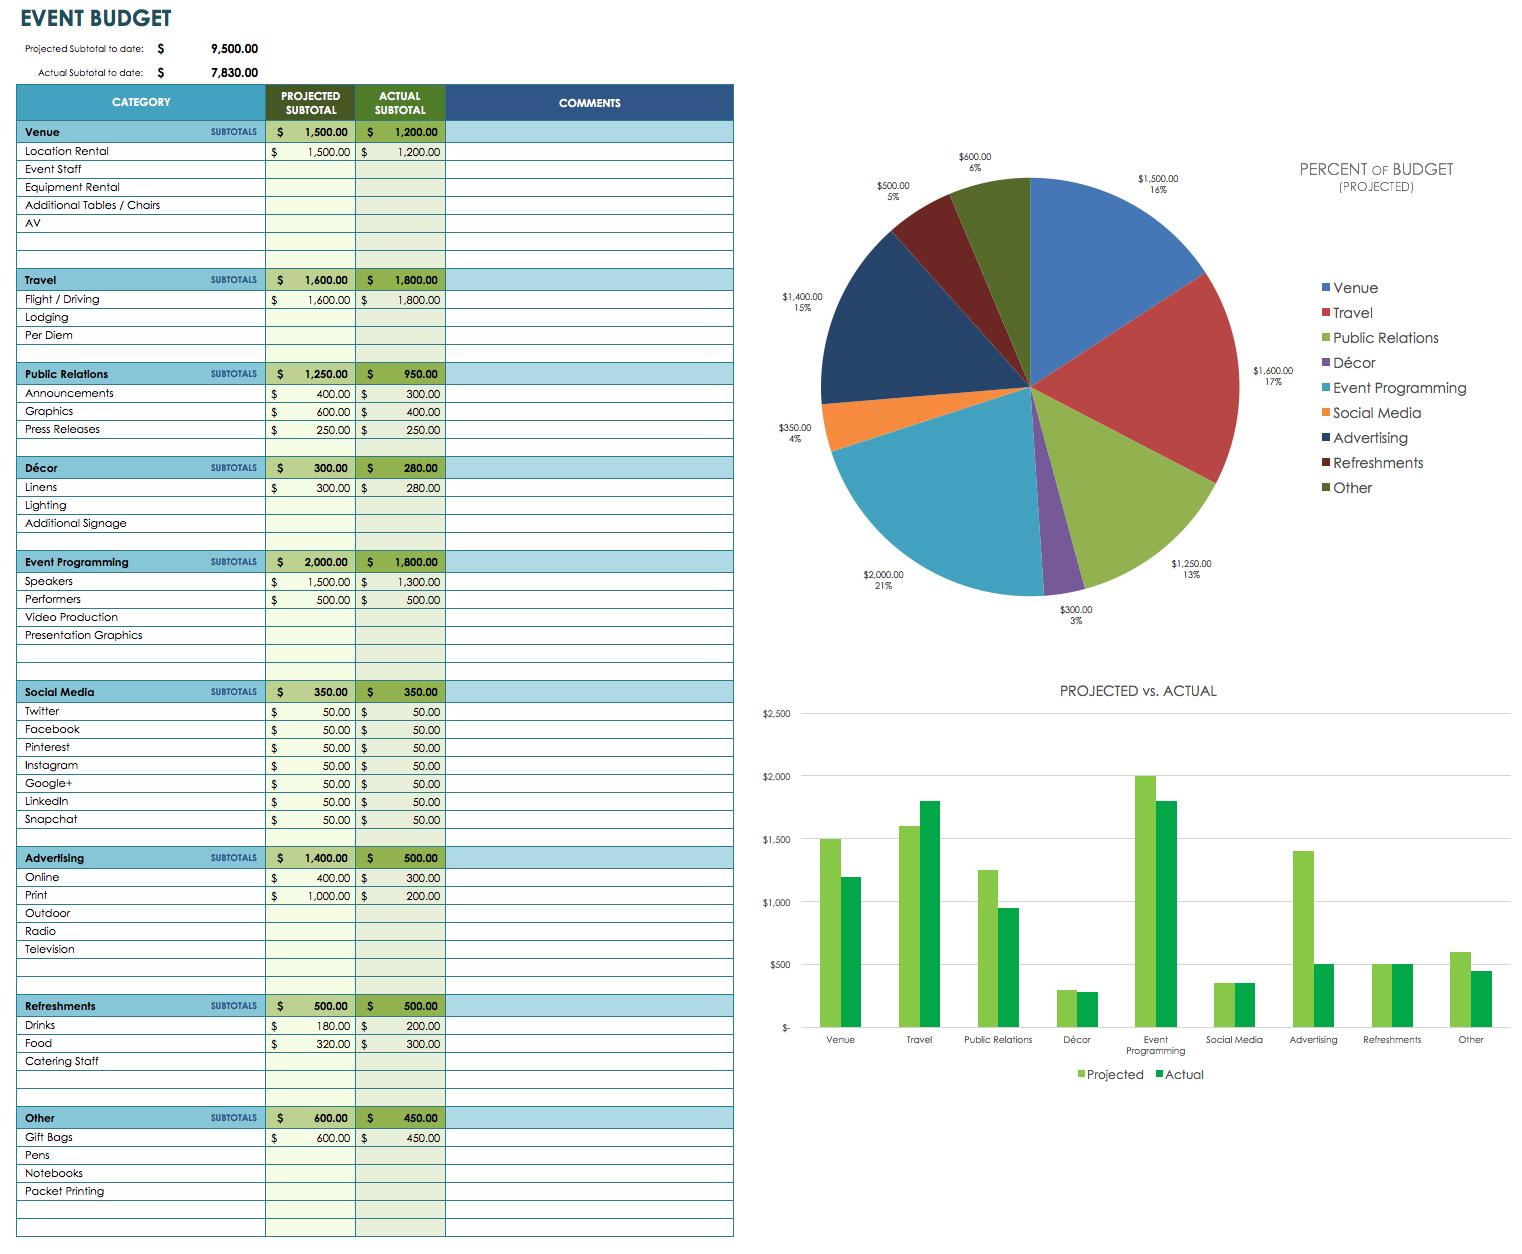 Free Financial Planning Templates | Smartsheet Inside Sample Budget Spreadsheet Excel